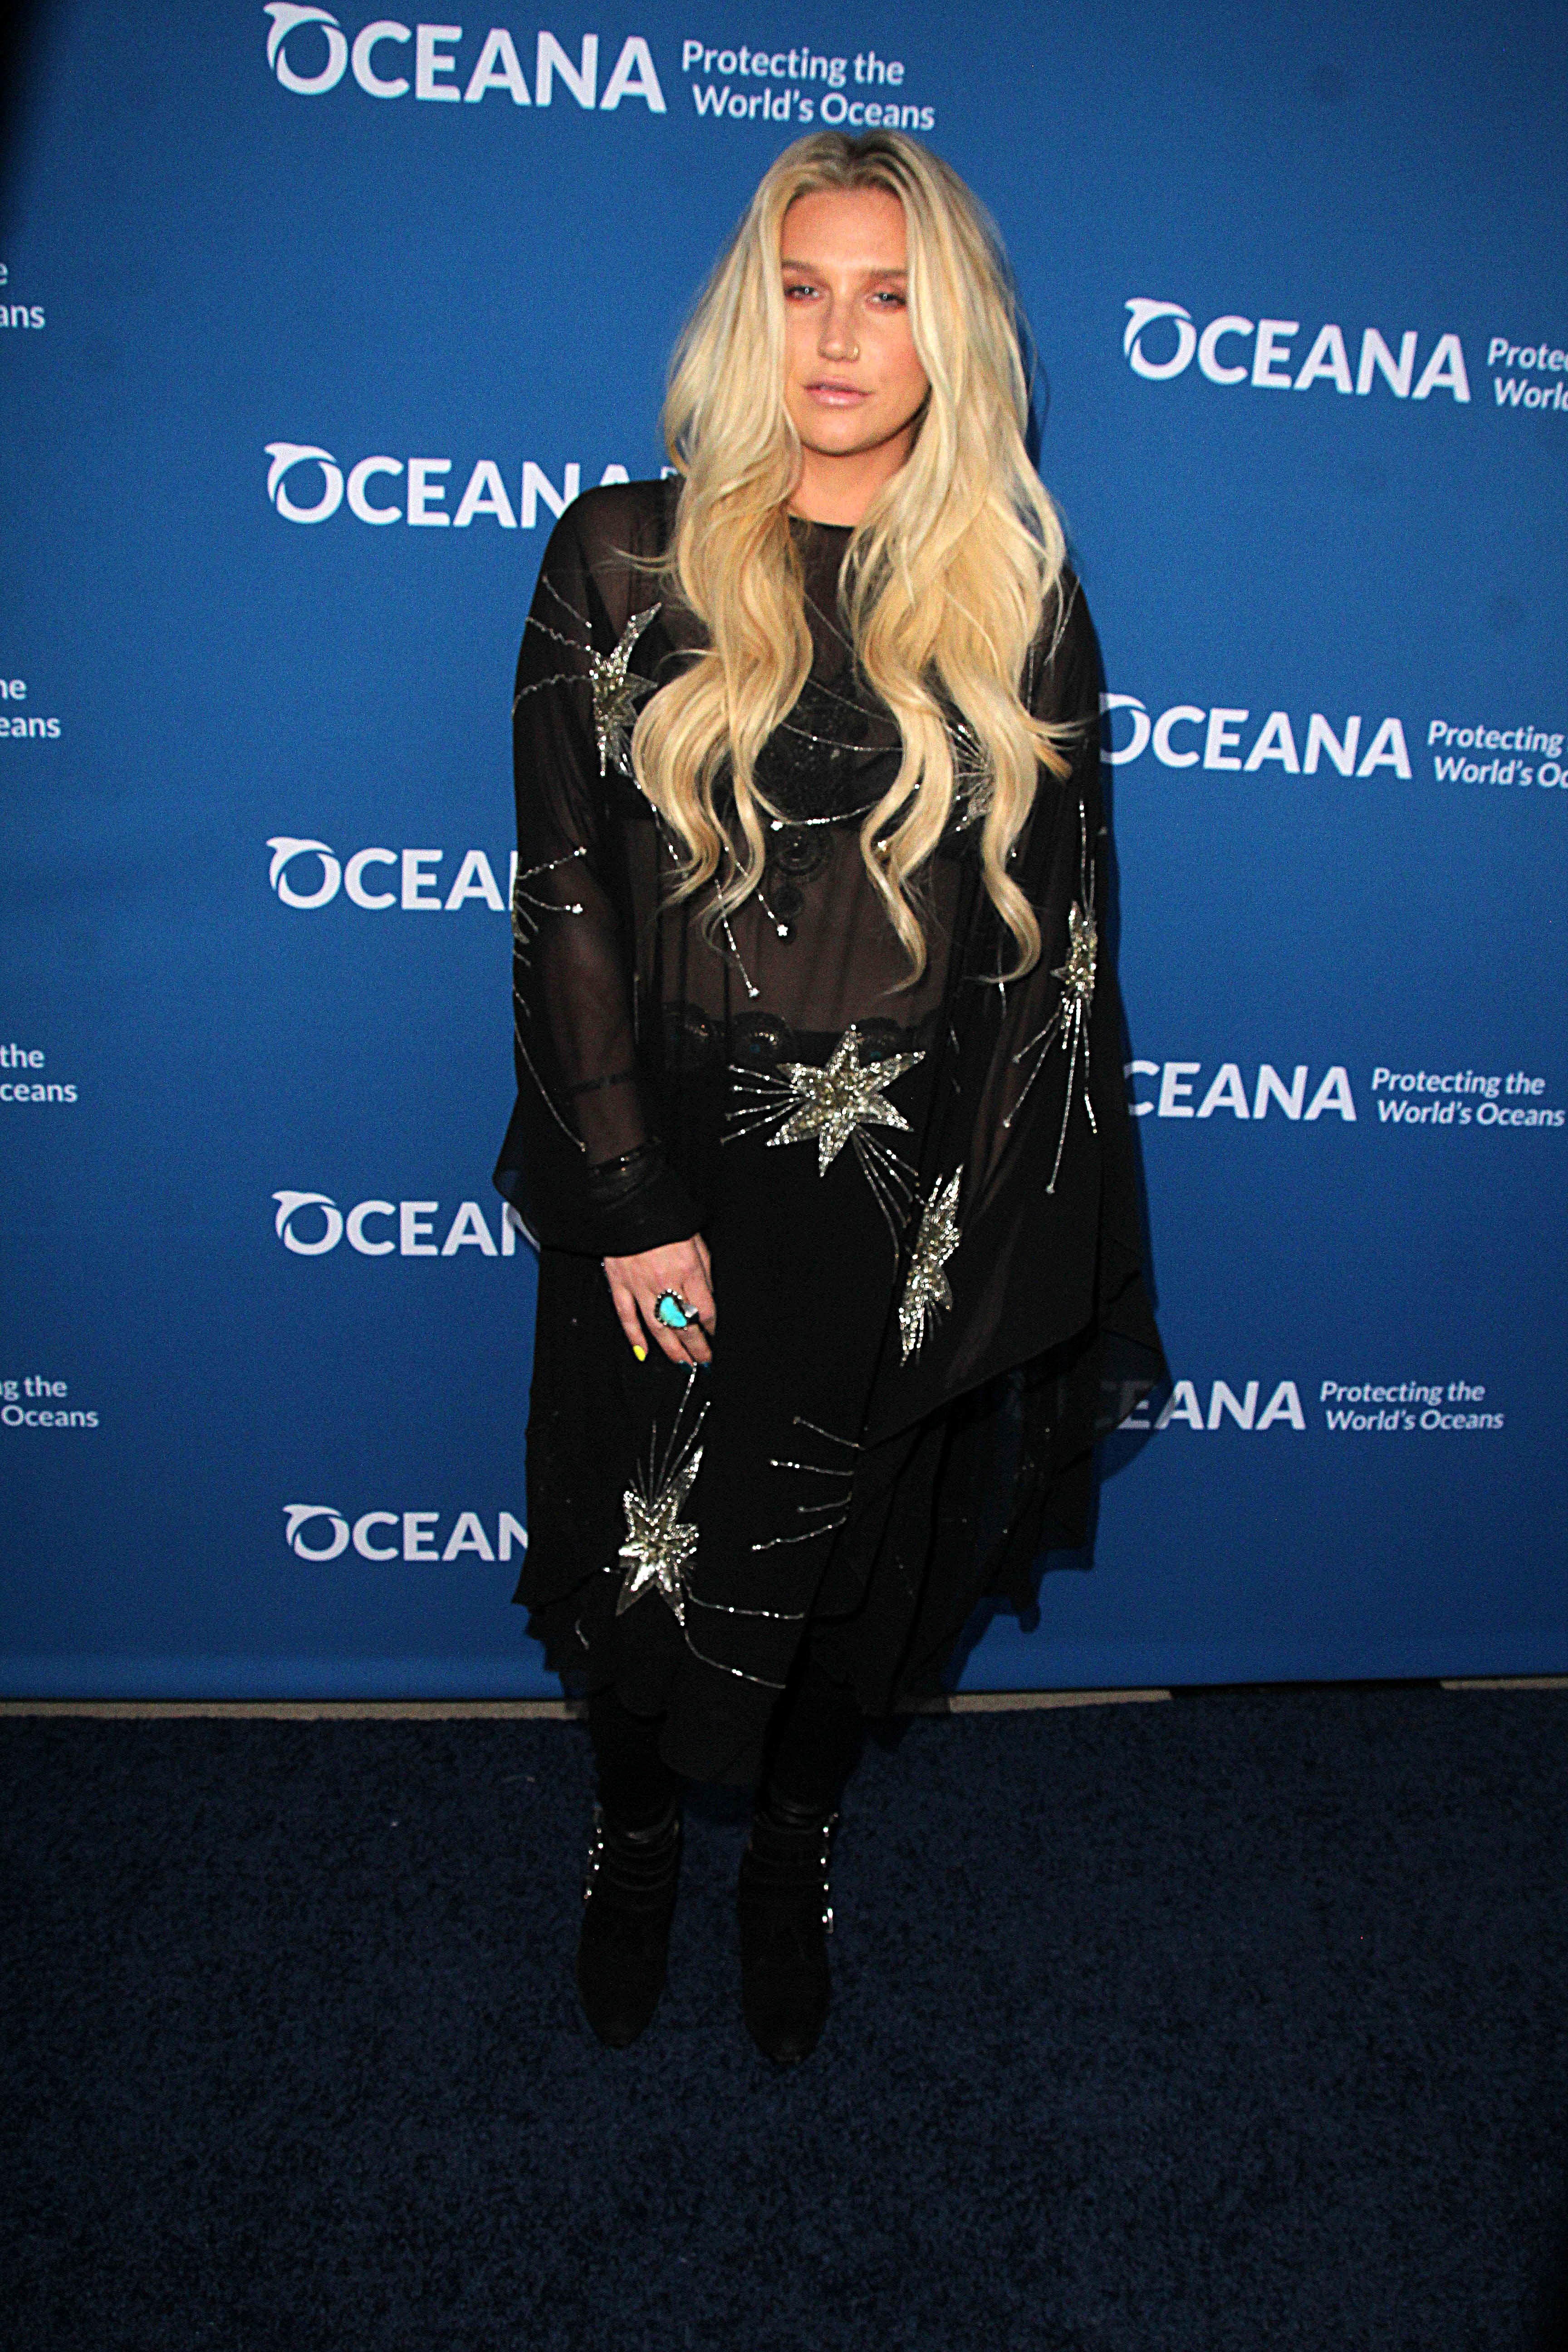 Dr. Luke lawsuits against Kesha tossed by judge